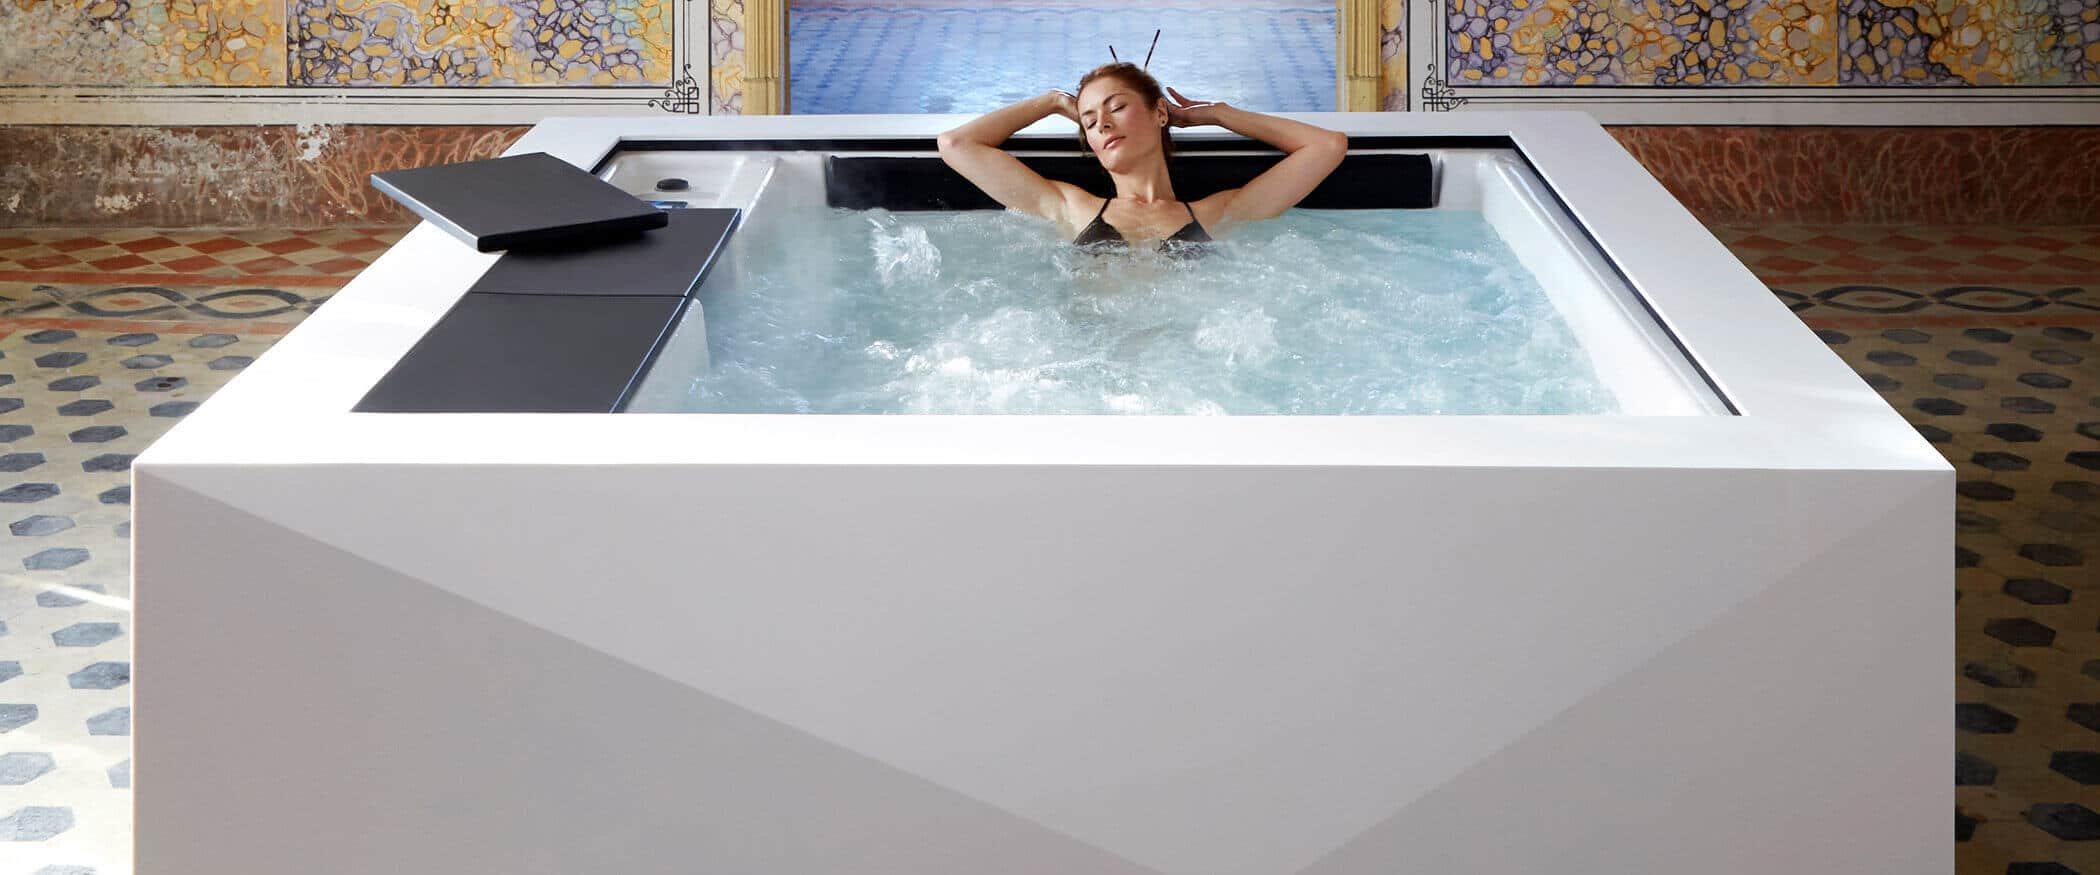 Buy the design hot tub Origami - Aquavia Spa UK